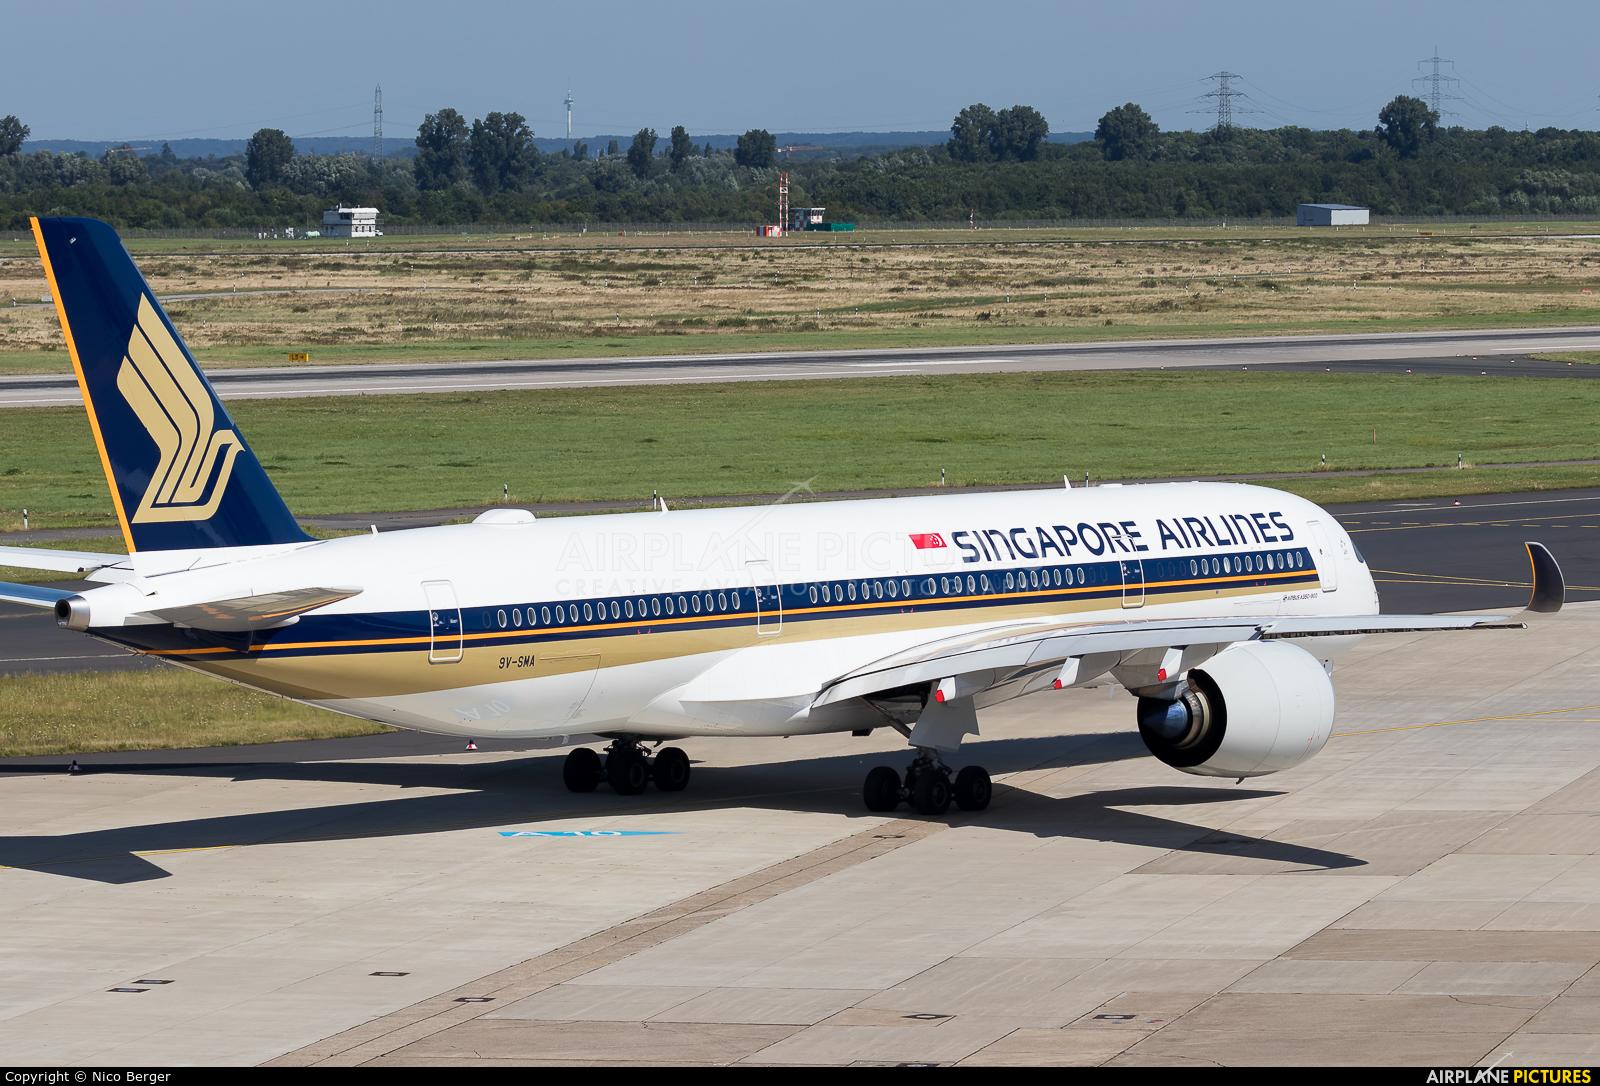 Singapore Airlines 9V-SMA aircraft at Düsseldorf